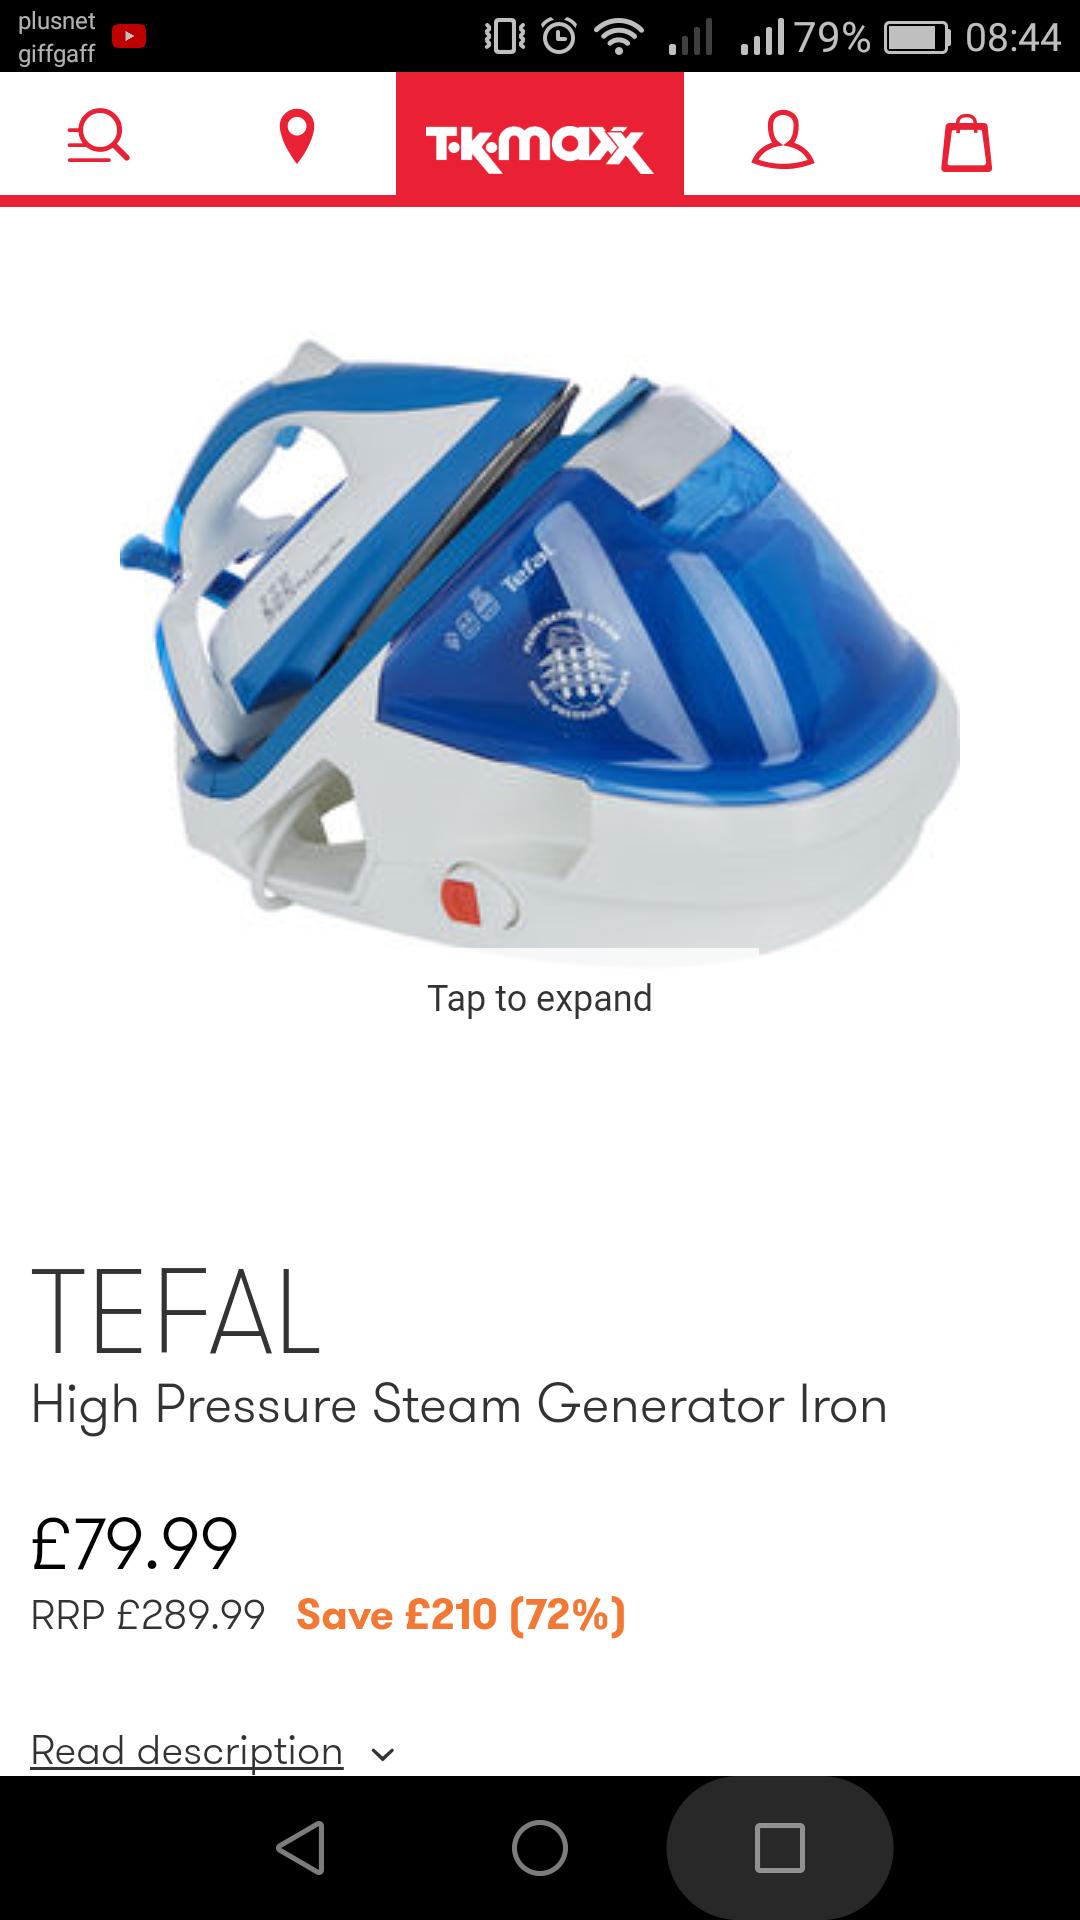 Tefal steam generator iron £79.99 originally £289.99 @ TkMaxx